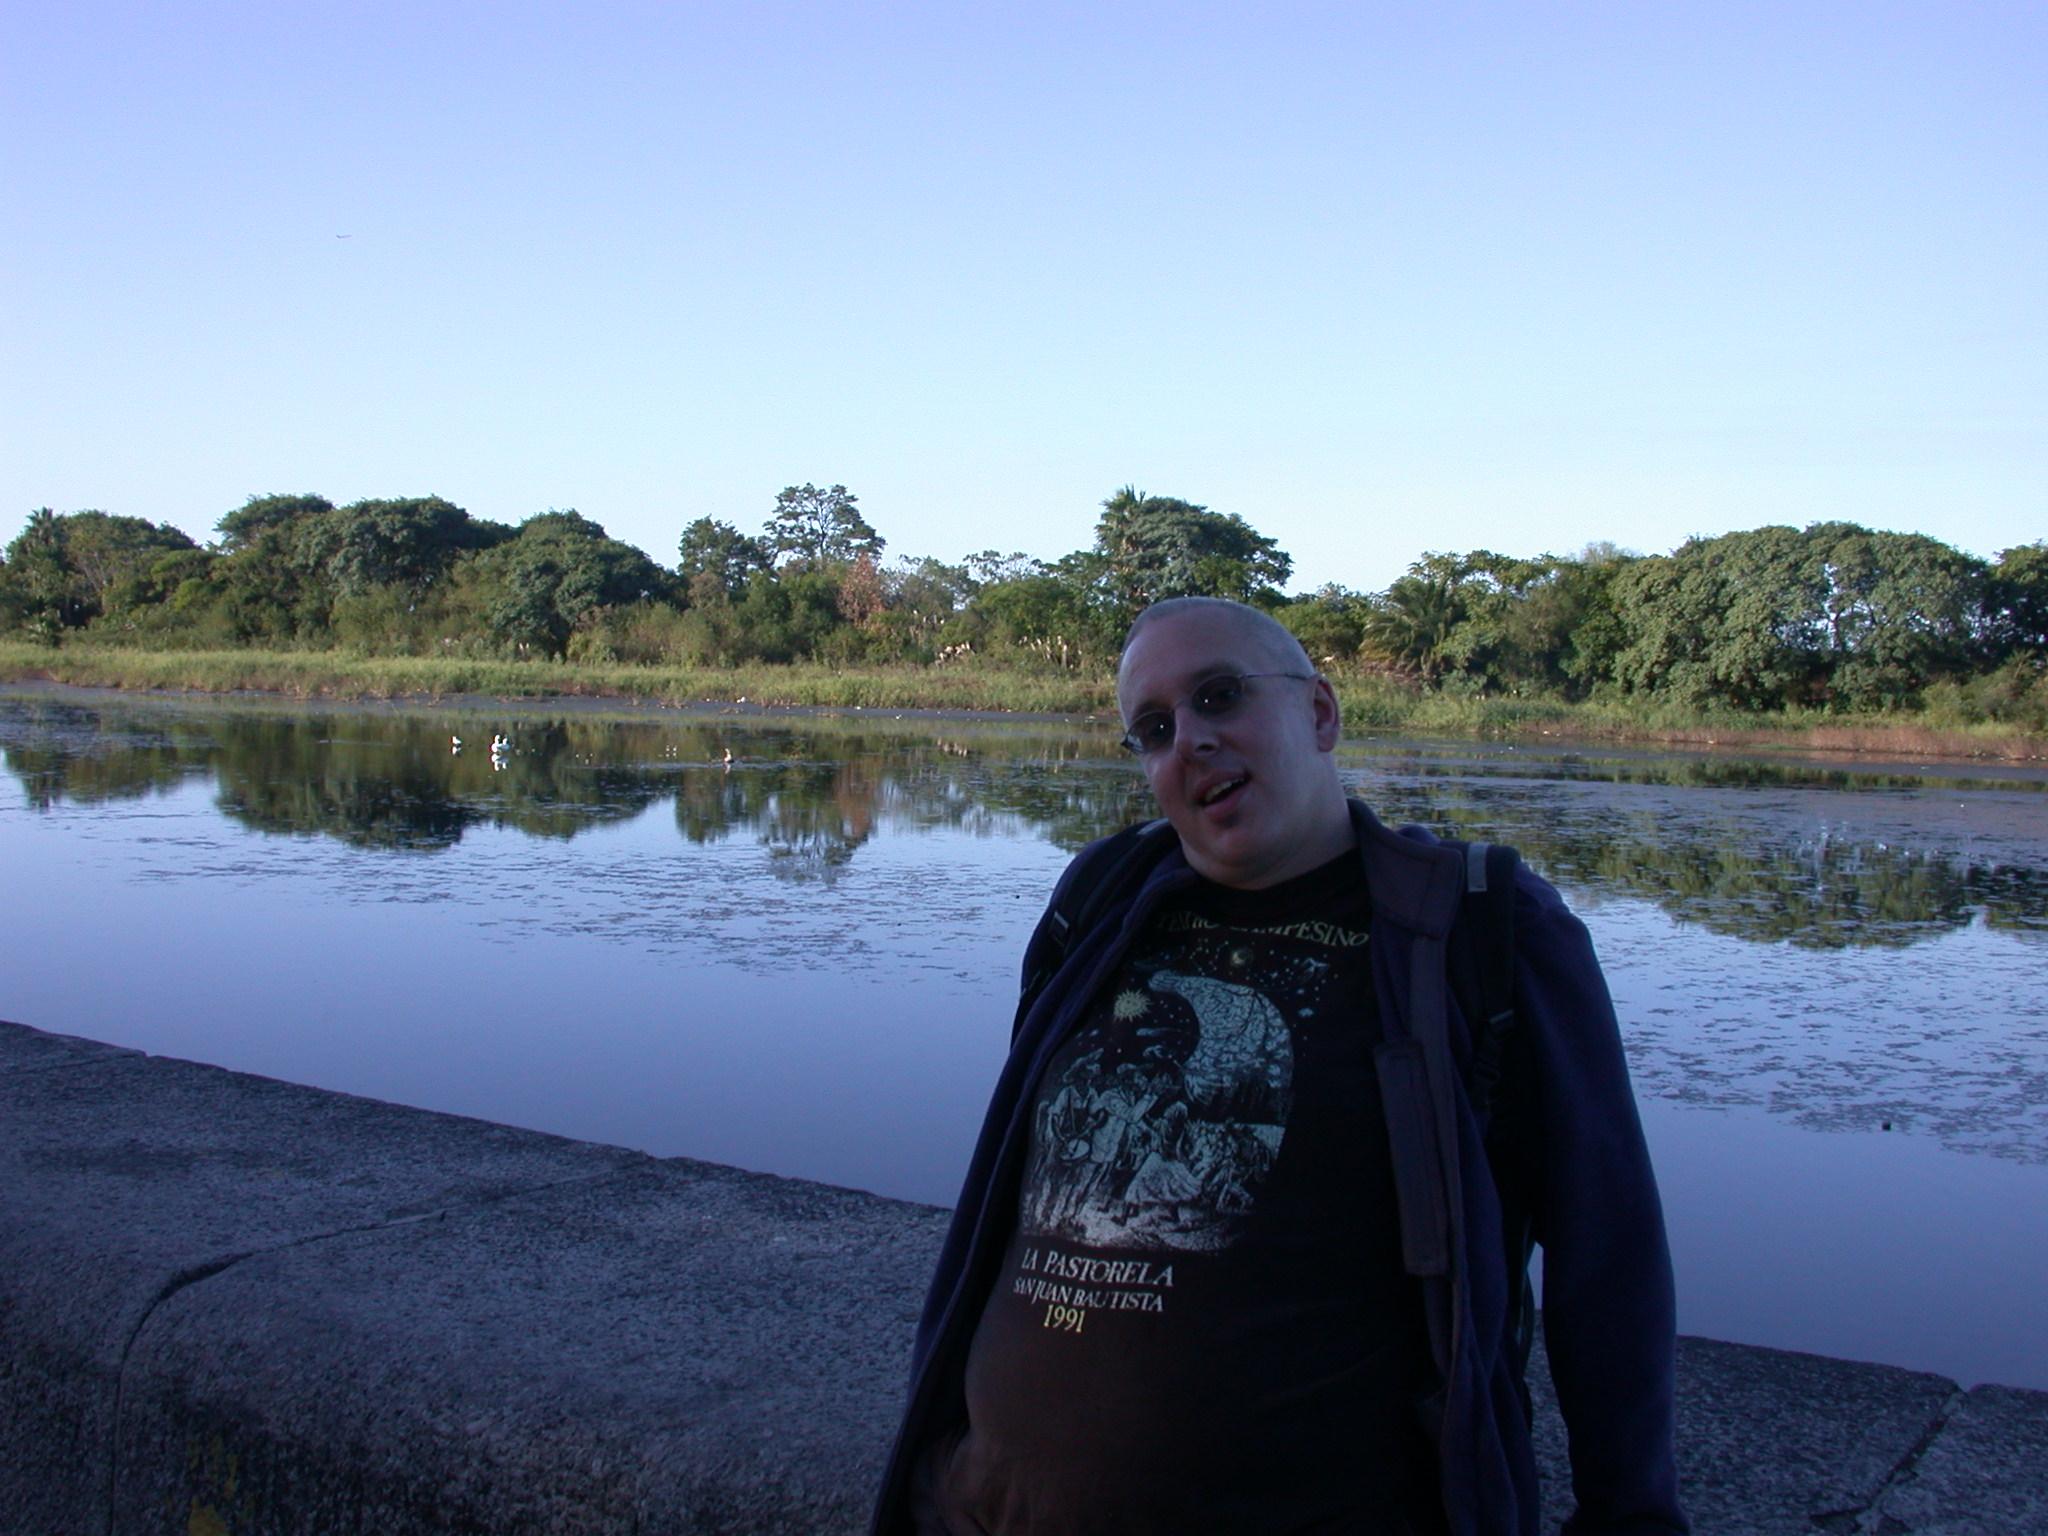 Jim e Sparklepants, Costanera Sur, Puerto Madero, Buenos Aires, Argentina